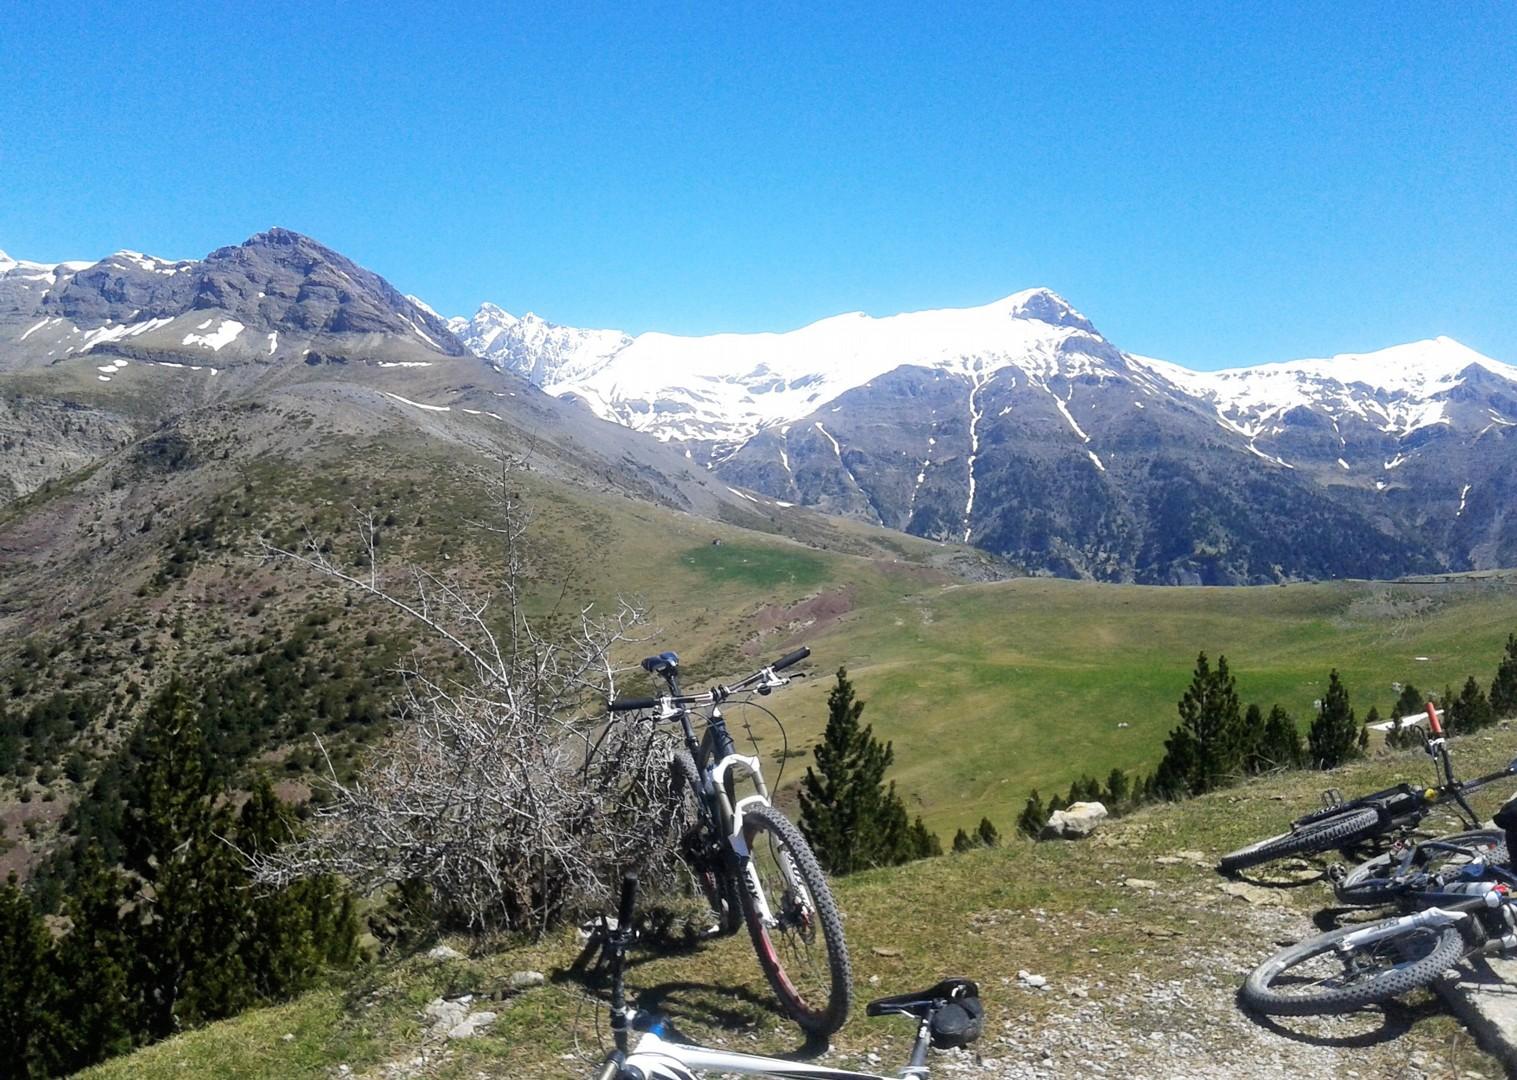 20160516_122145.jpg - Spain - Pyrenees Enduro - Guided Mountain Bike Holiday - Mountain Biking